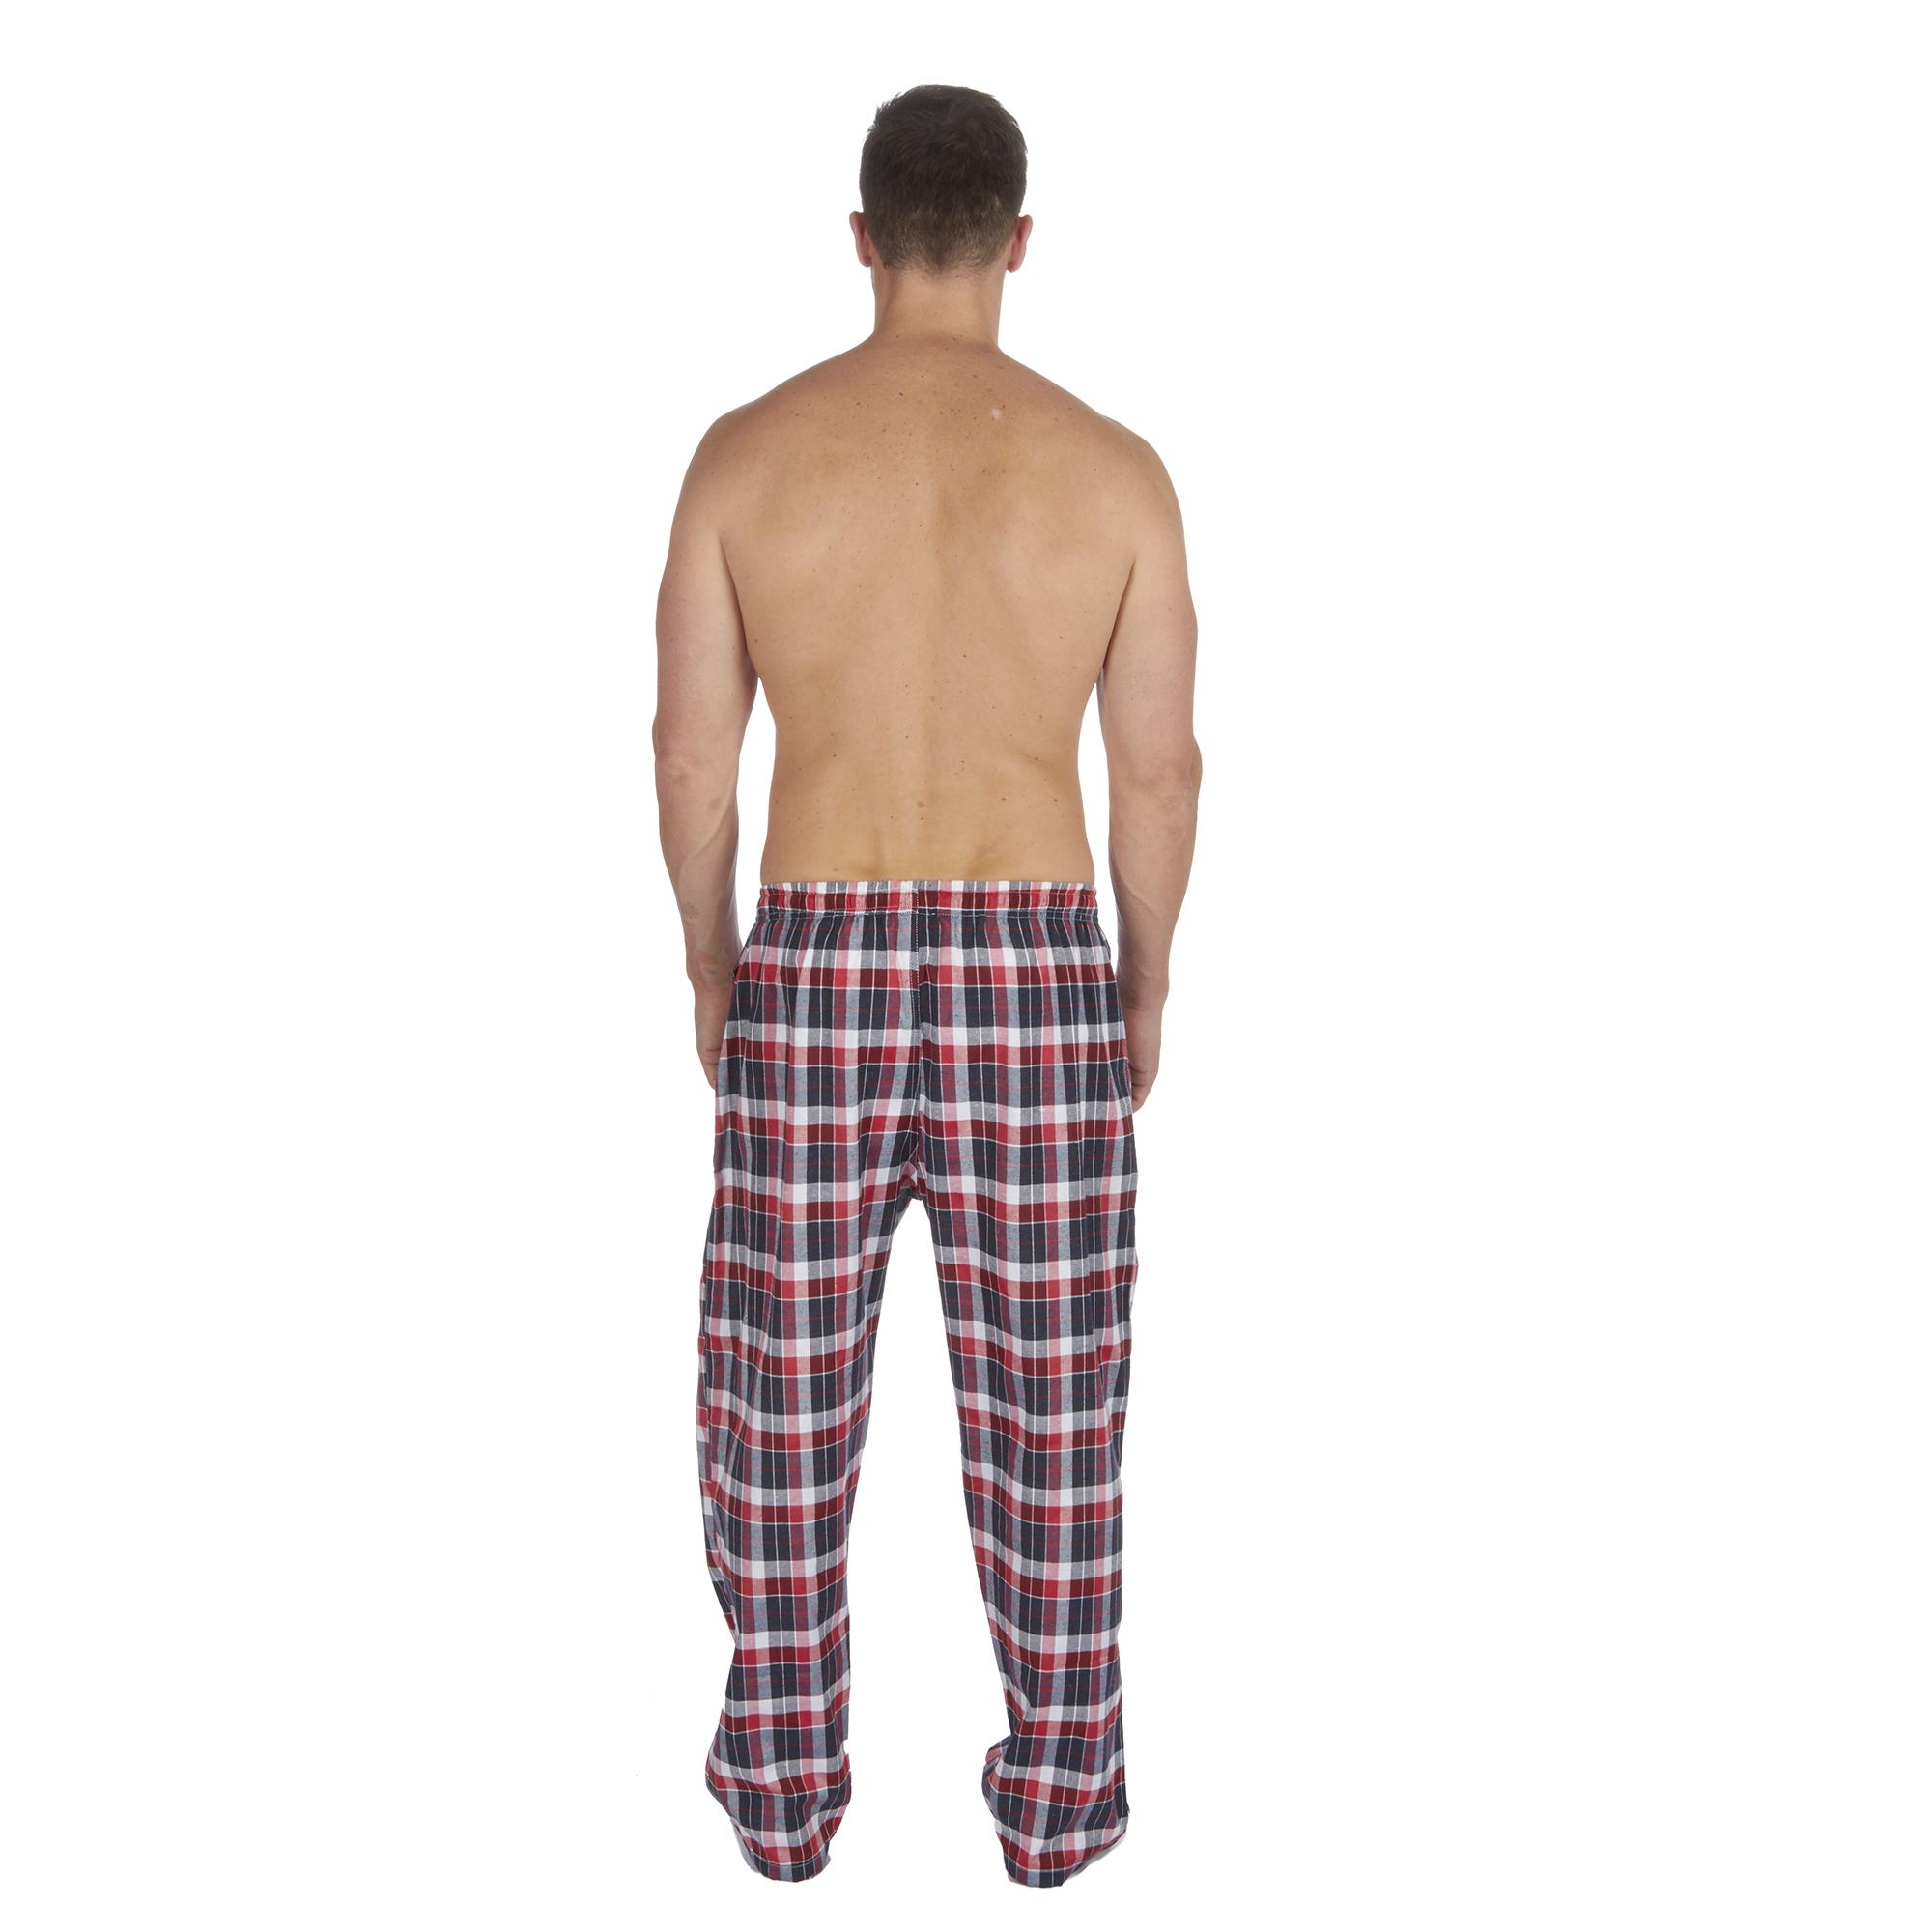 Jason-Jones-Homme-Carreaux-Tisse-Pyjama-Pantalon-en-Coton-Melange-Serge-PJ-Lounge-Pants miniature 26